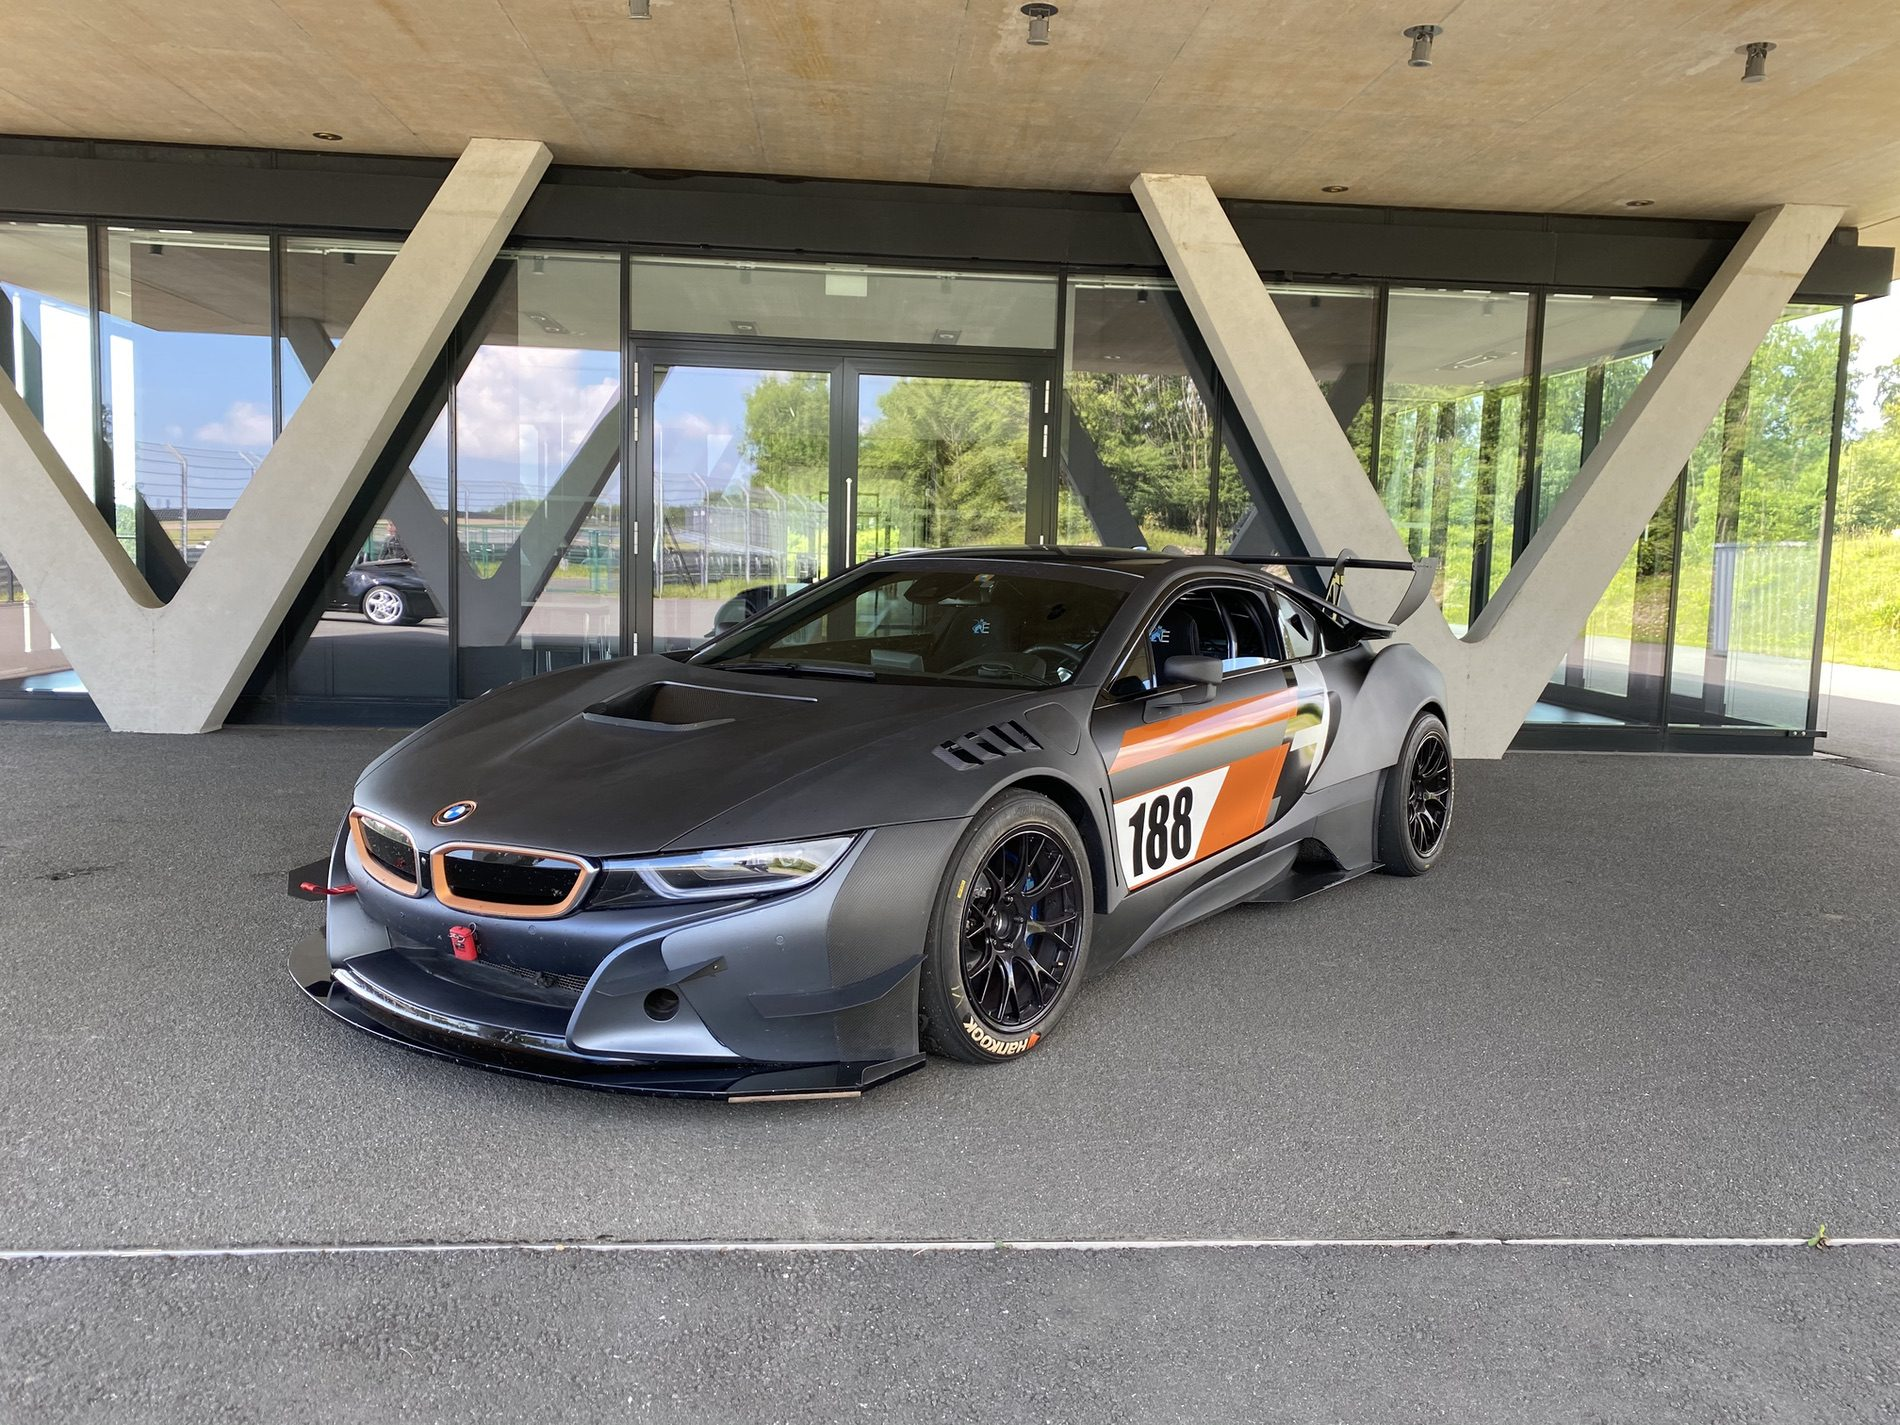 2013 - [BMW] i8 [i12] - Page 23 Bmw-i8-procar-by-edo-motorsport-looks-like-a-gt3-racing-car-145468_1